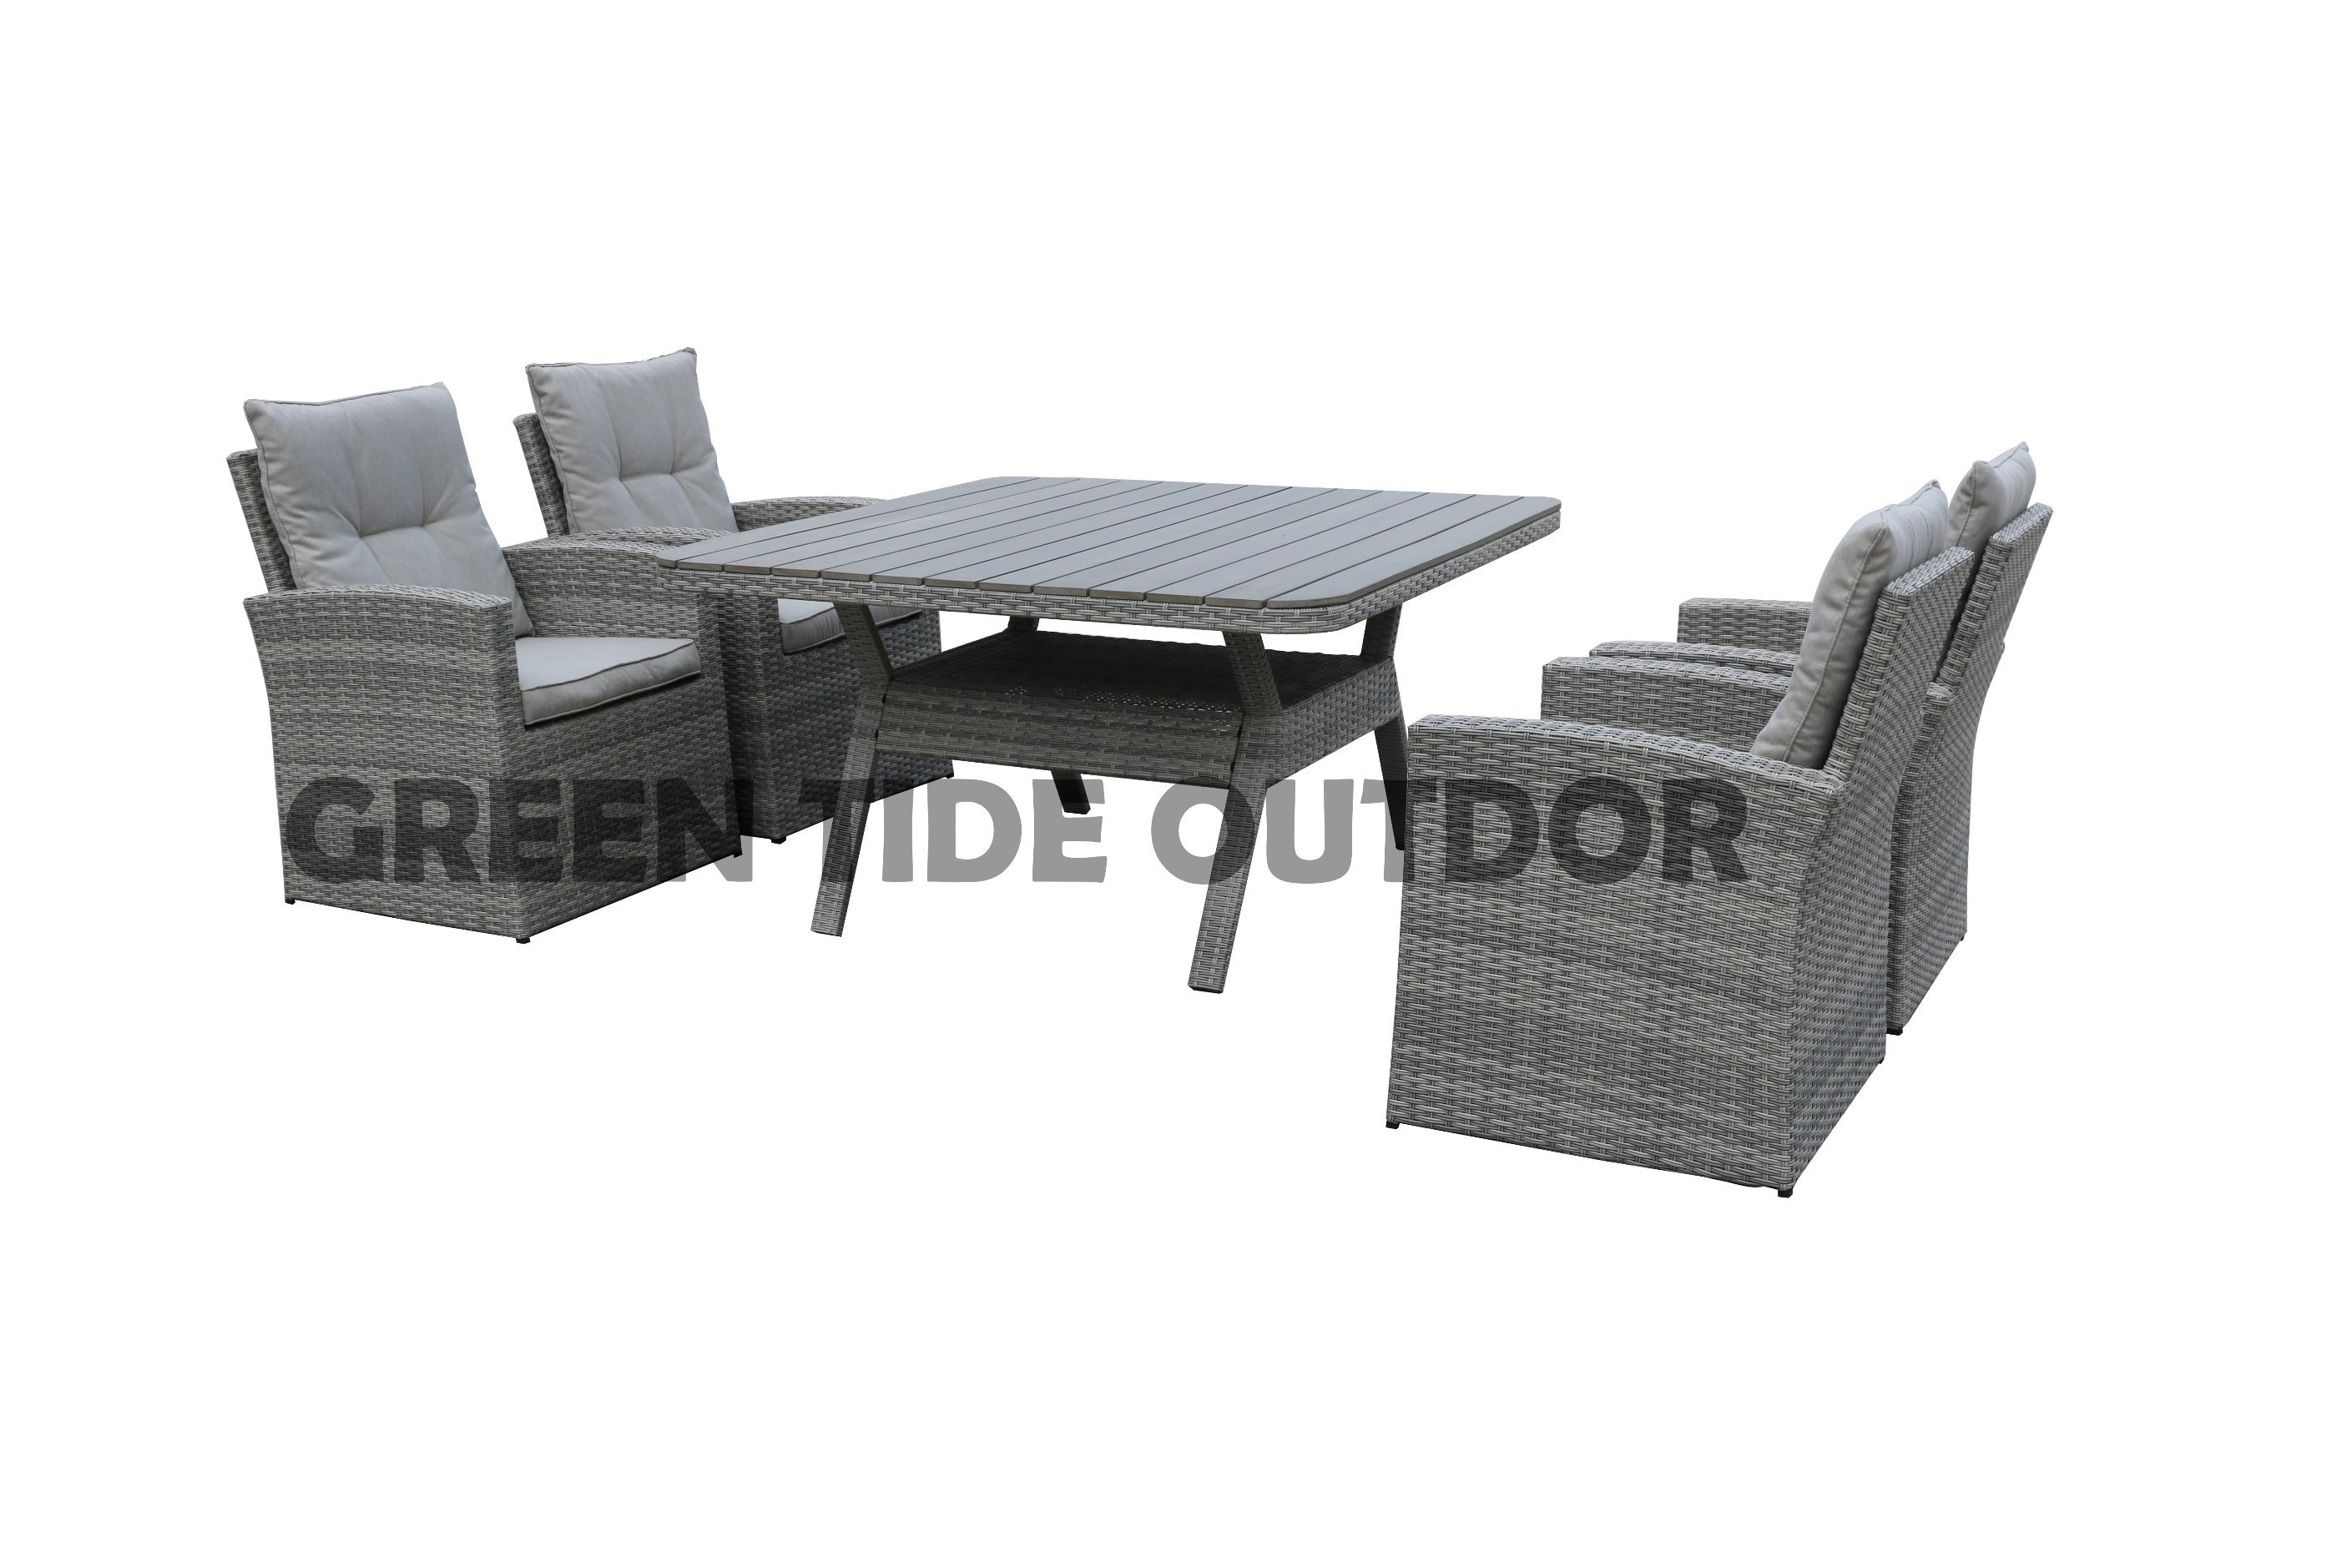 Dining Furniture Sofa Set 5pcs